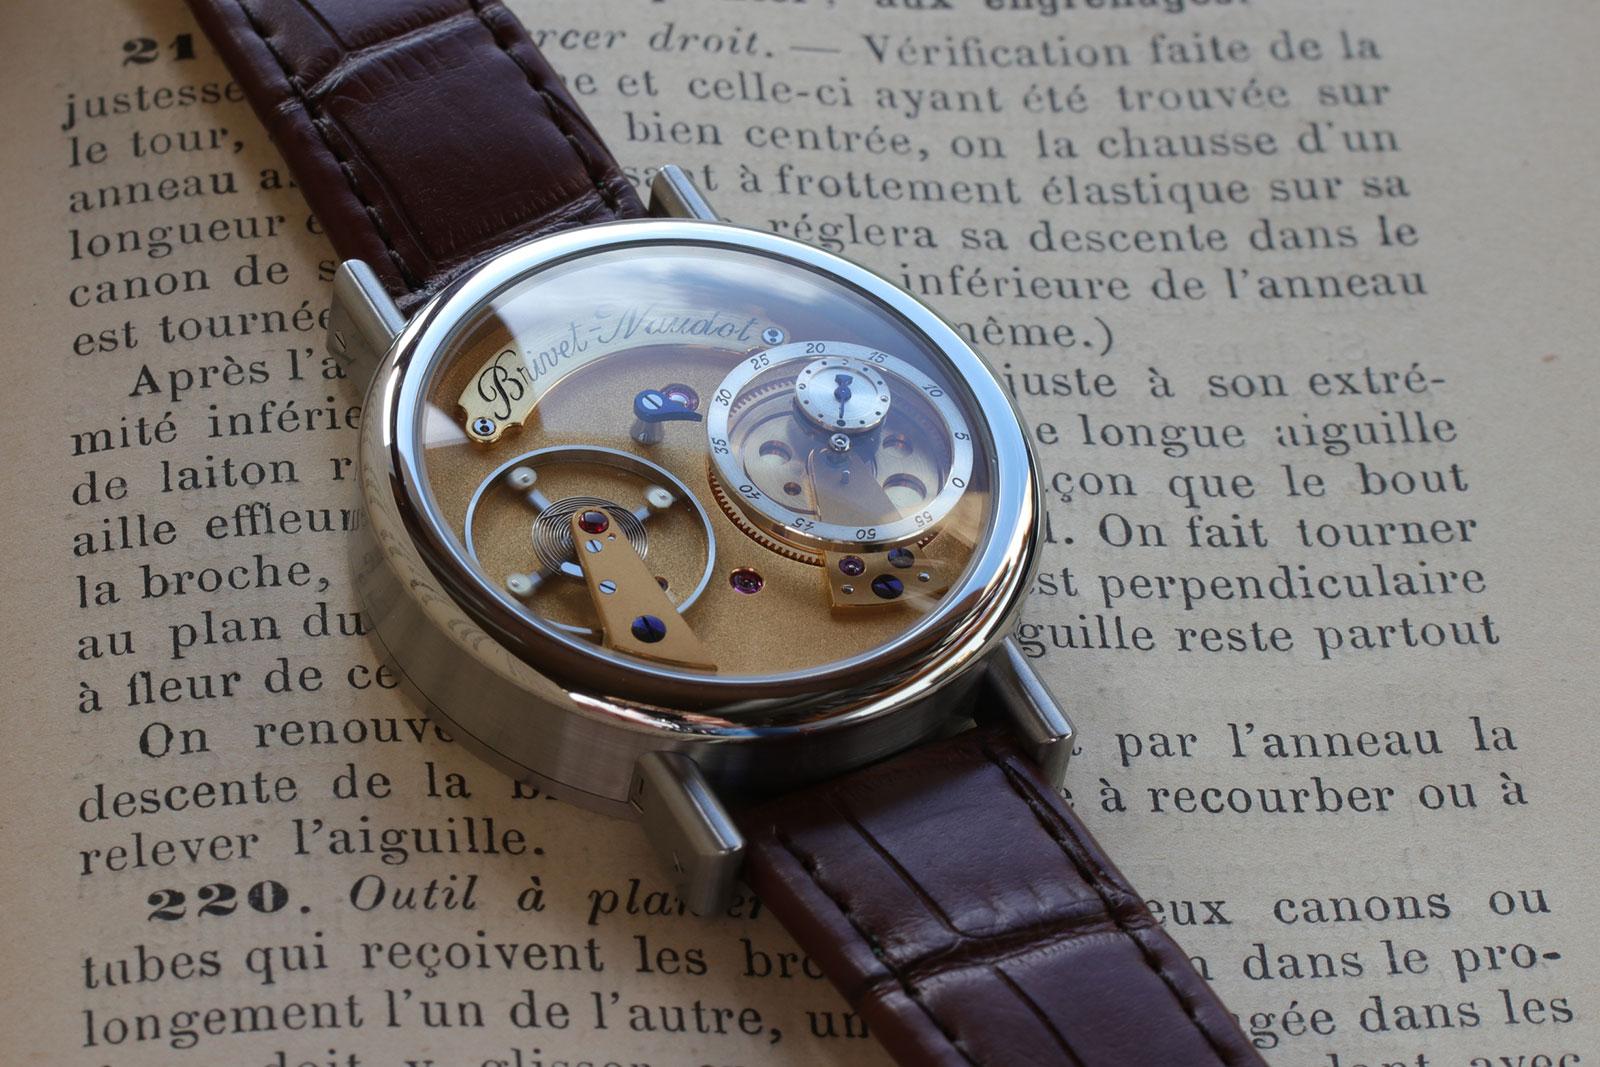 Brivet-Naudot wristwatch 1